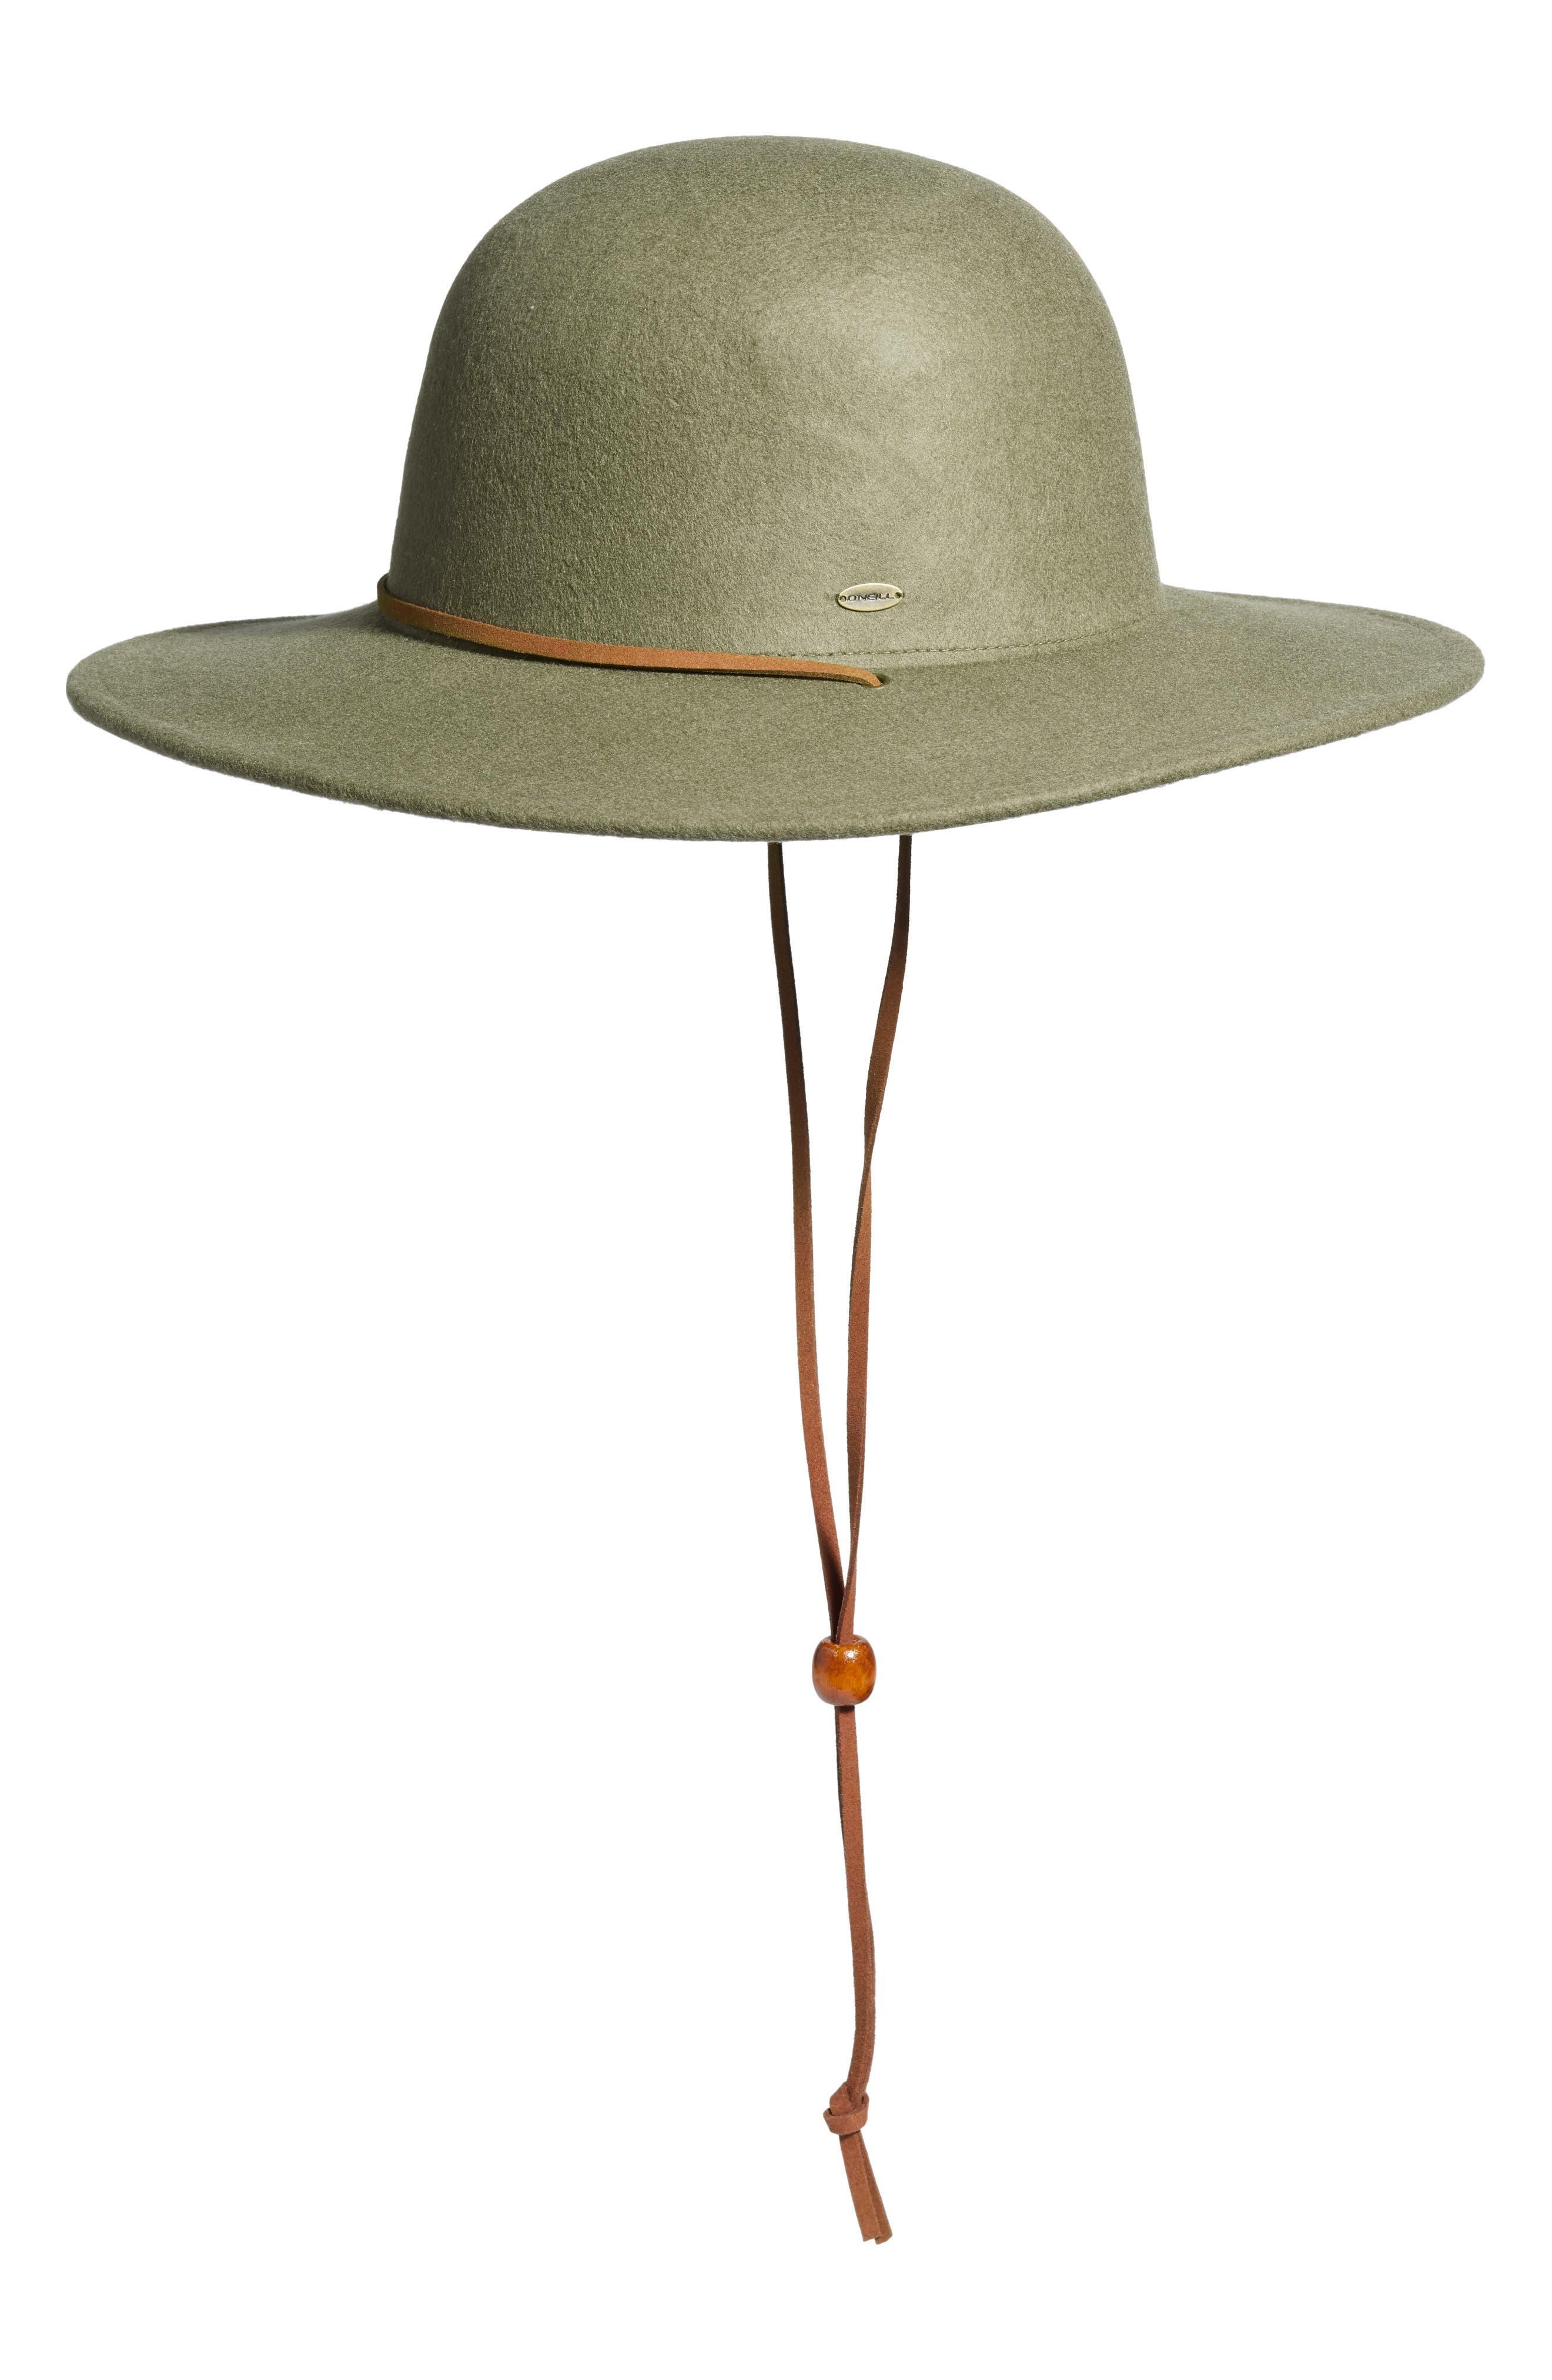 Trail Ride Wool Felt Hat,                             Main thumbnail 1, color,                             KANGAROO